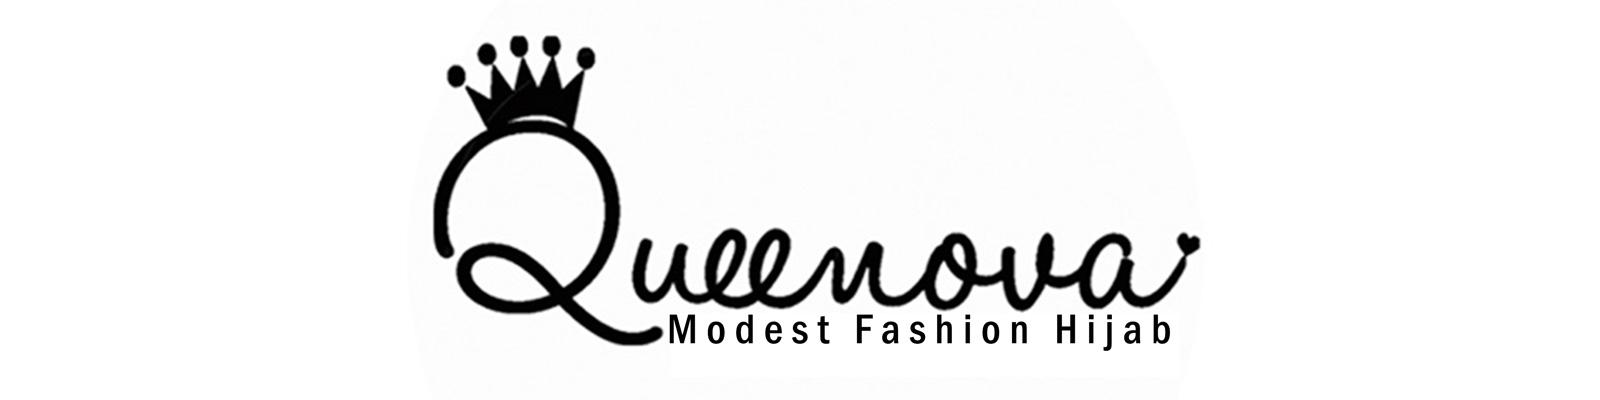 Modest Fashion, Koleksi Baju Hijab Modern, Baju Muslimah Modis Online, Busana Muslim Modis Ter